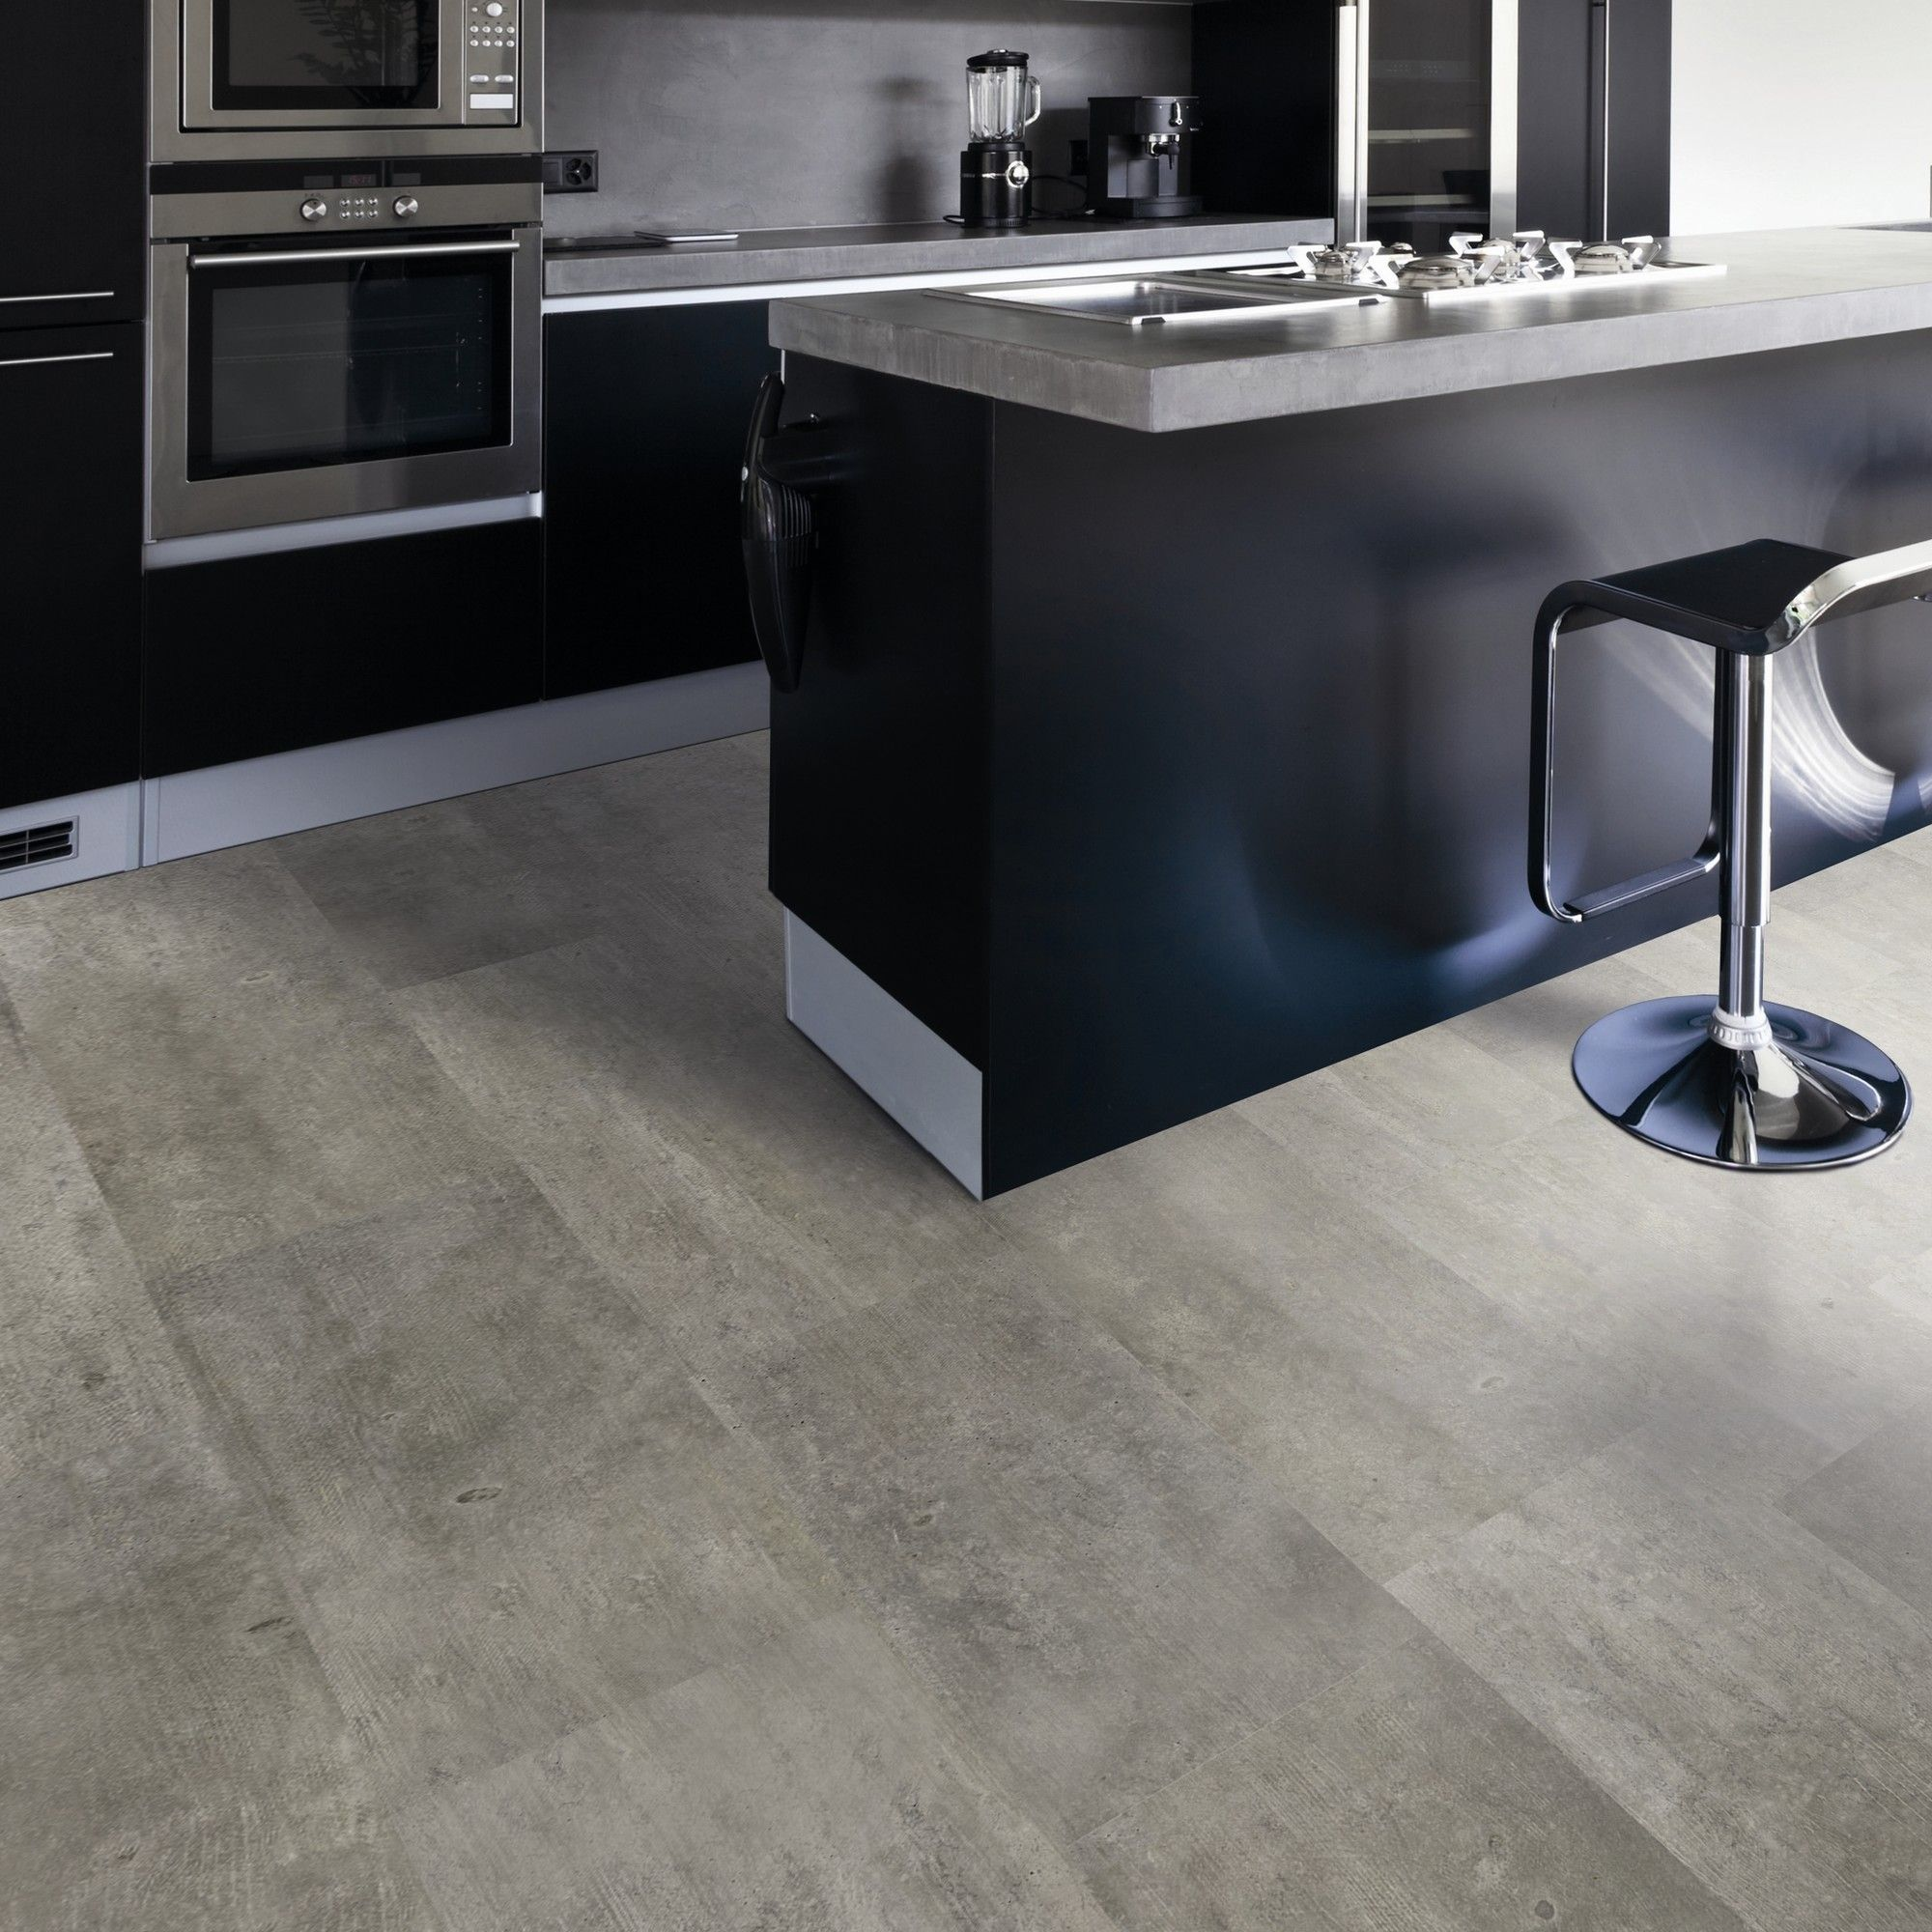 Wicanders artcomfort 11 58 engineered cork flooring in beton haze hardwood flooring dailygadgetfo Choice Image